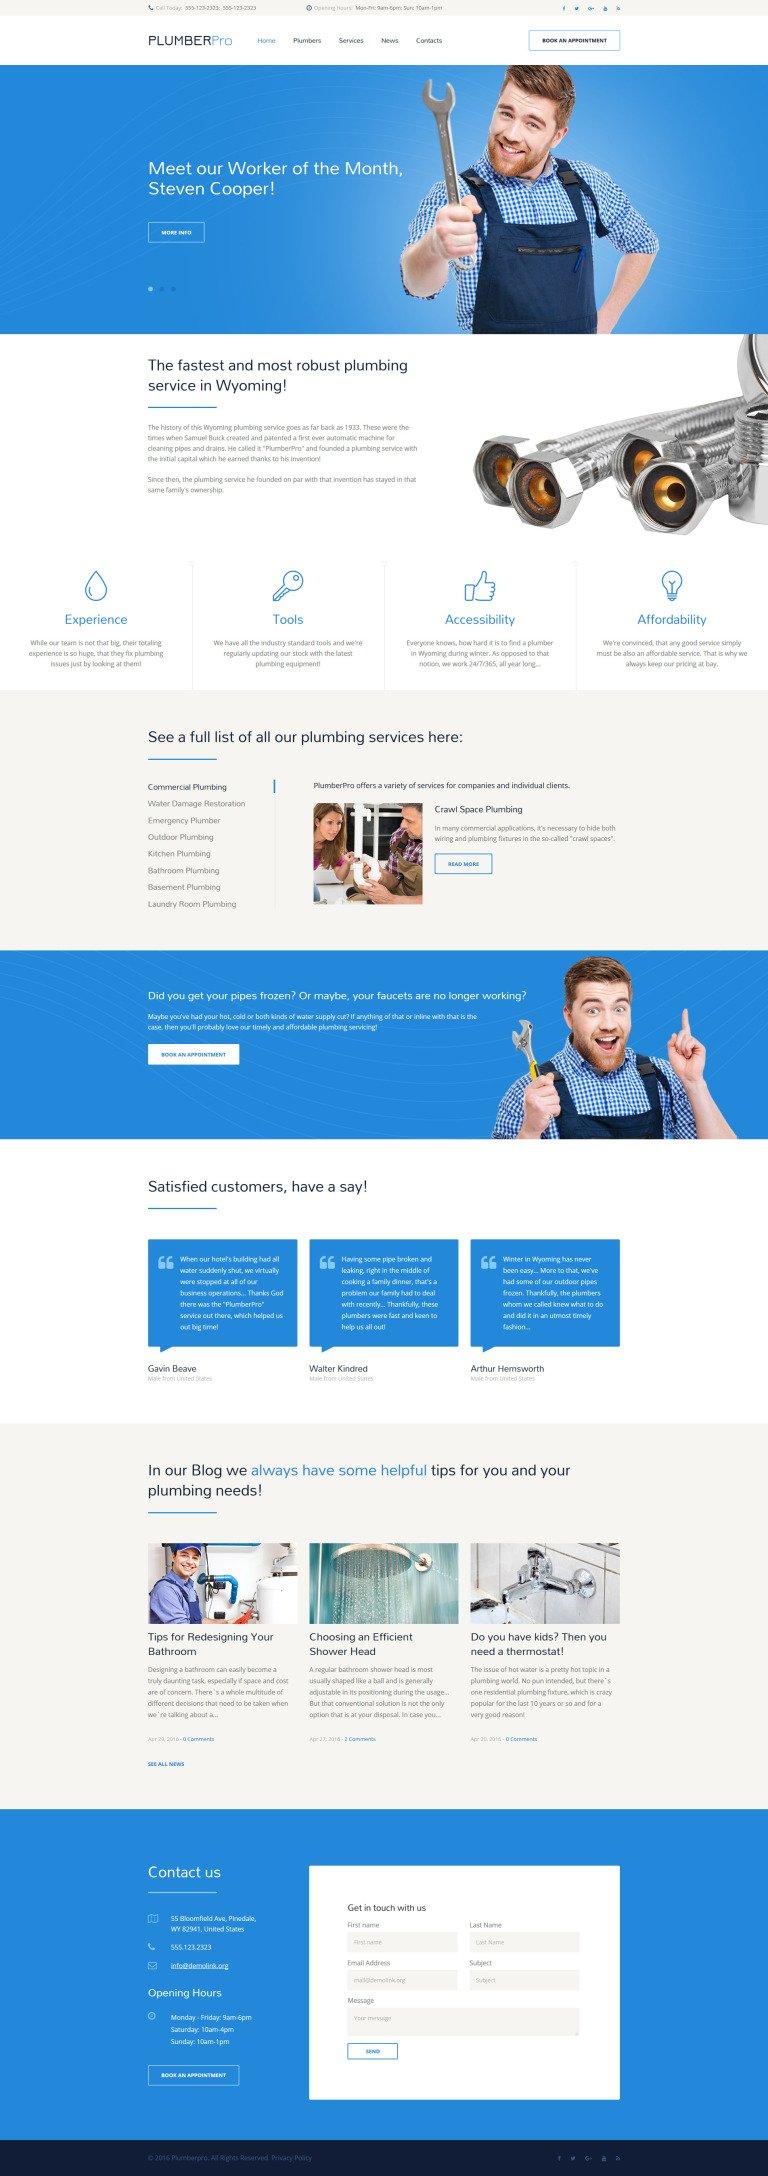 PlumberPro Website Template New Screenshots BIG